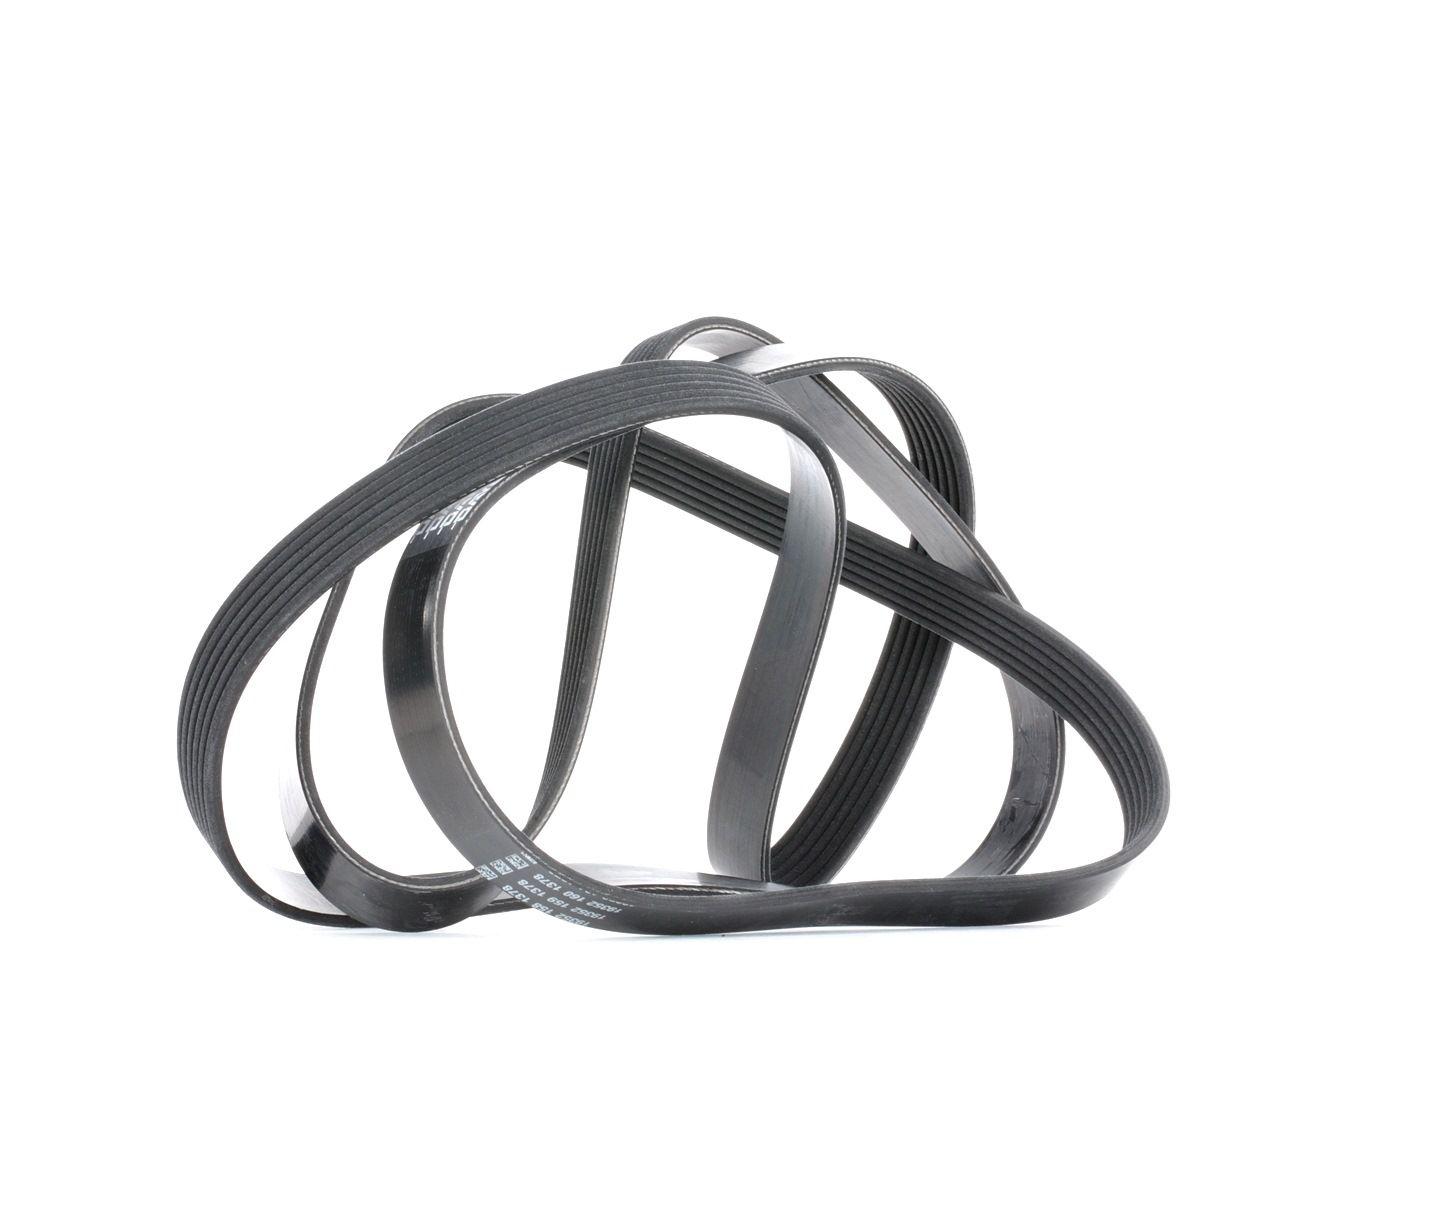 Ribbed Belt DAYCO 6PK2263 rating